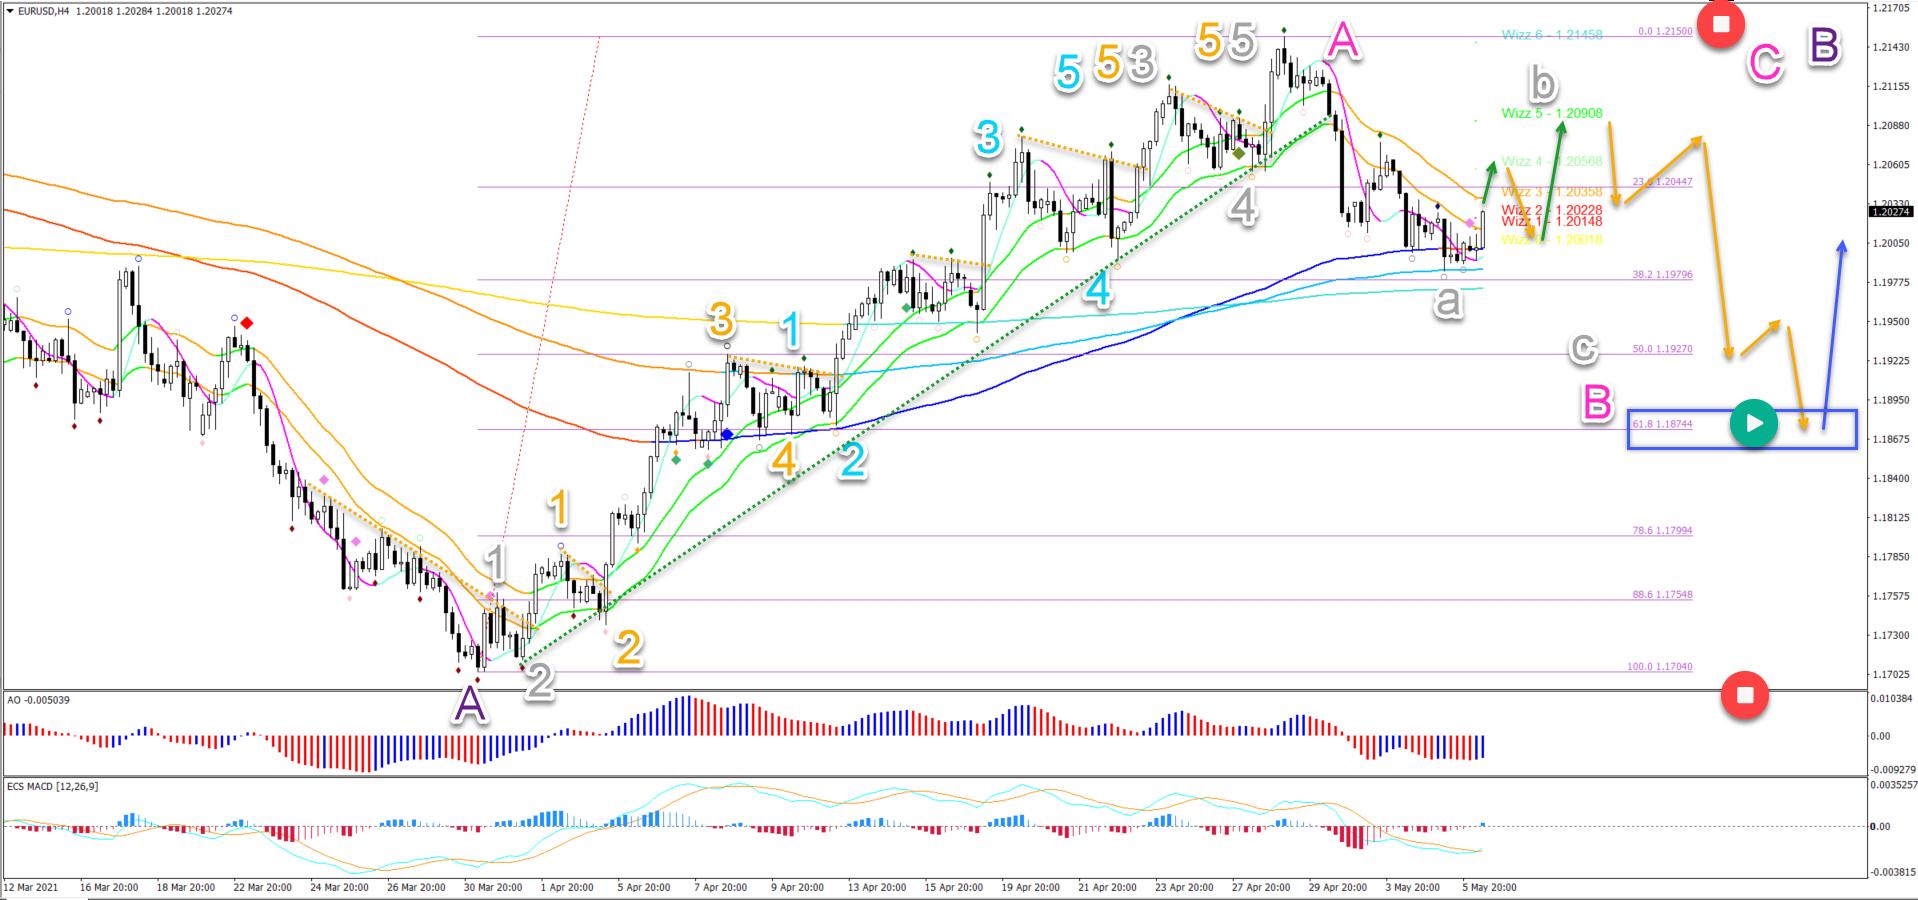 EUR/USD 6.5.2021 4 hour chart